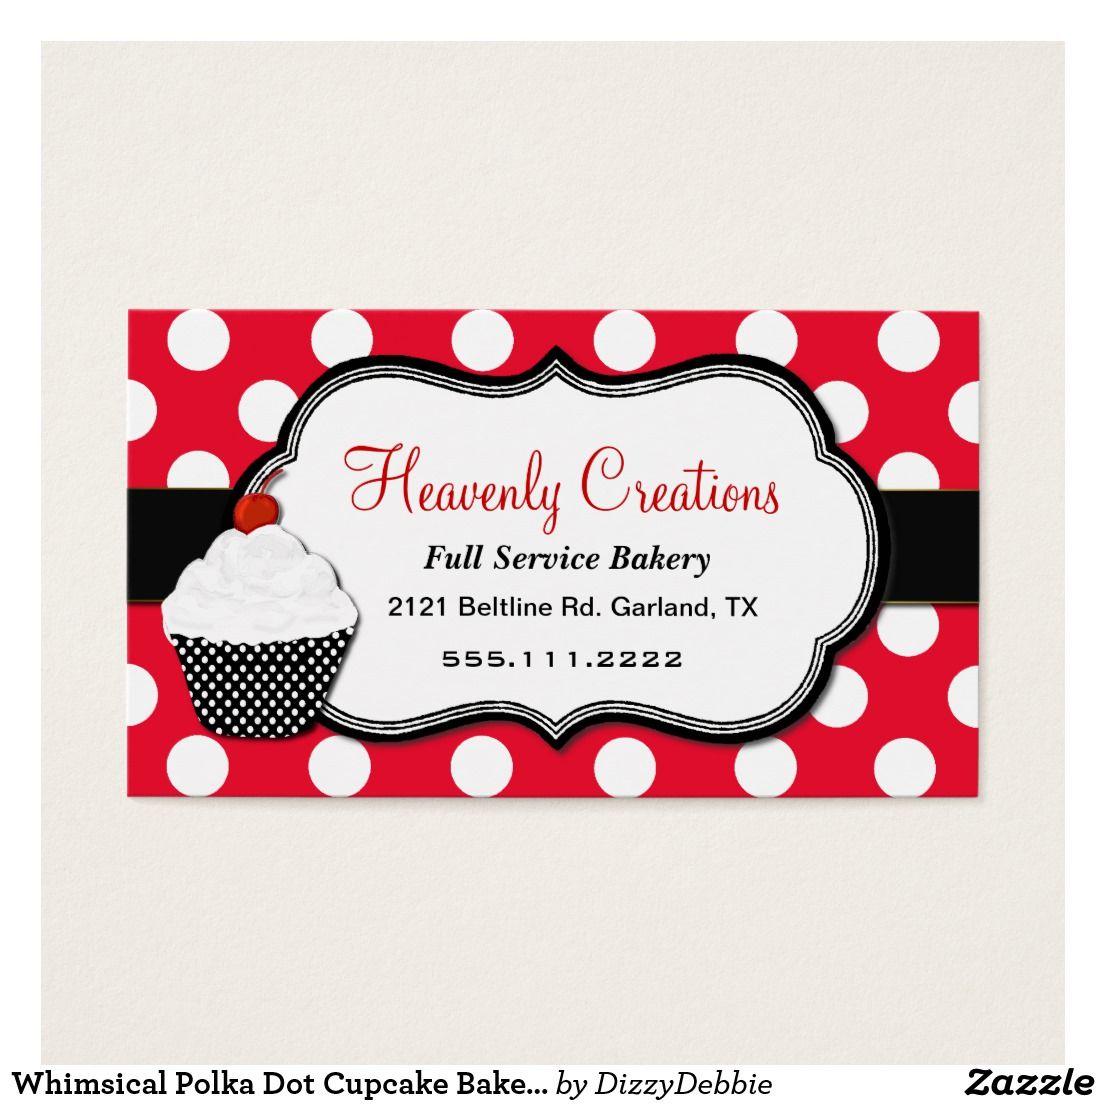 Whimsical Polka Dot Cupcake Bakery Business Card | Bakery business ...